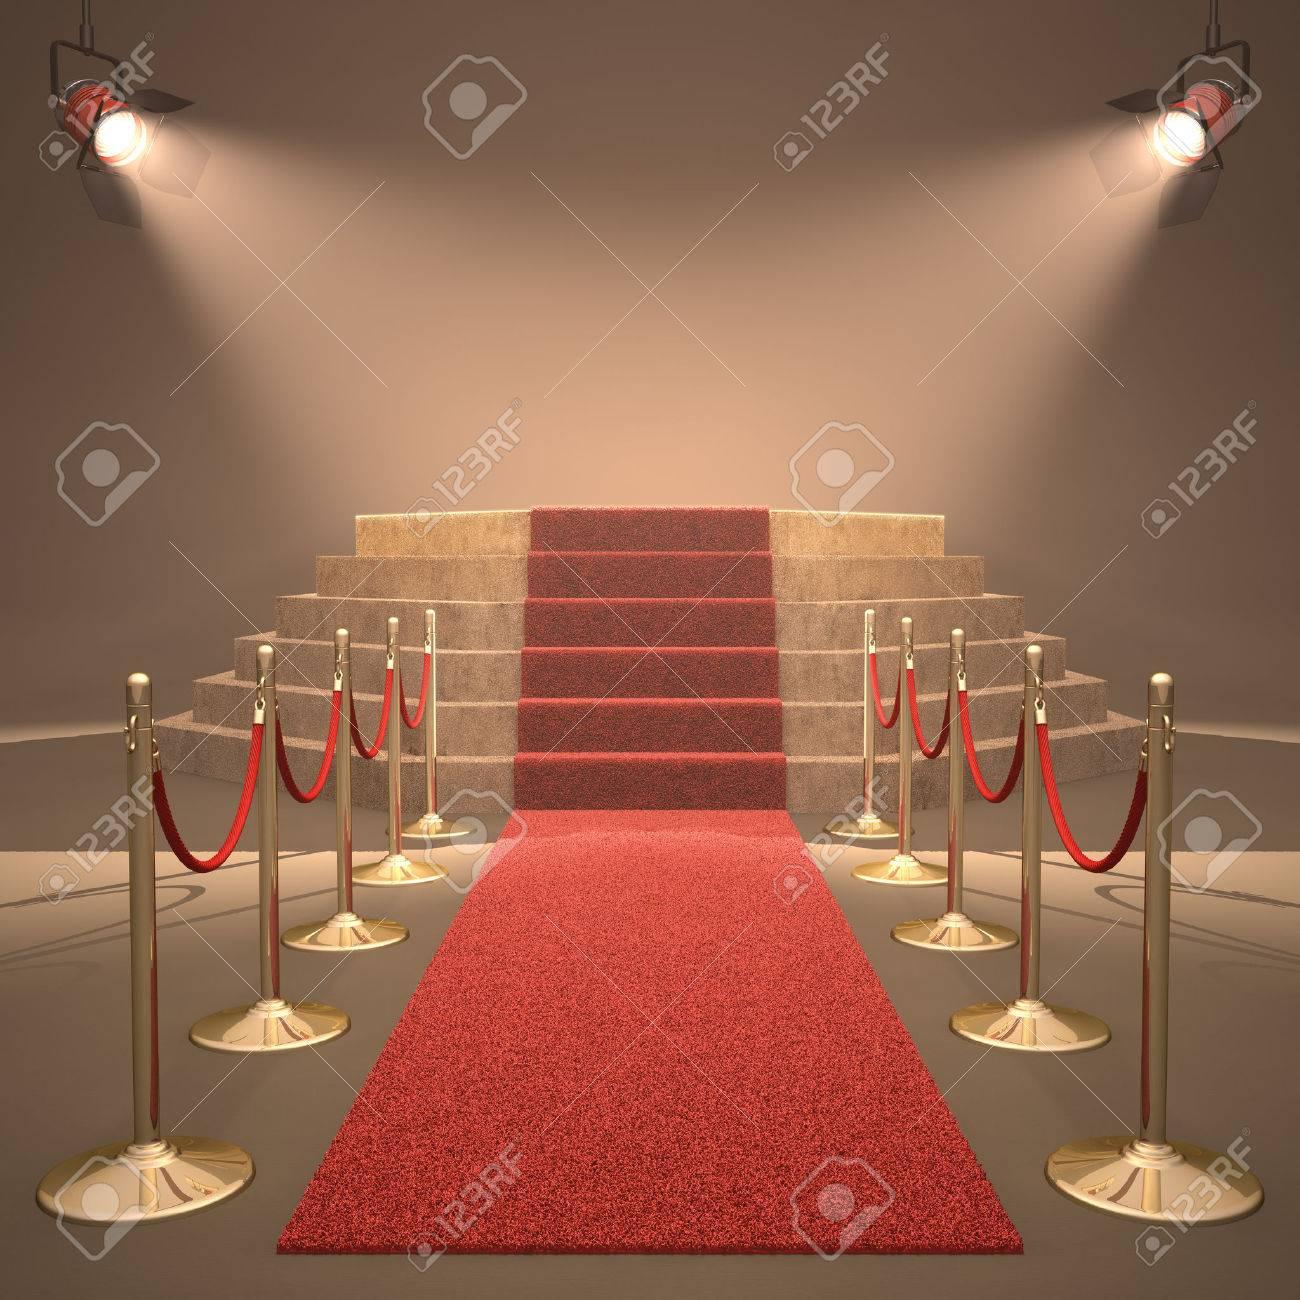 Lights illuminating the podium. Your text in light. - 23009181